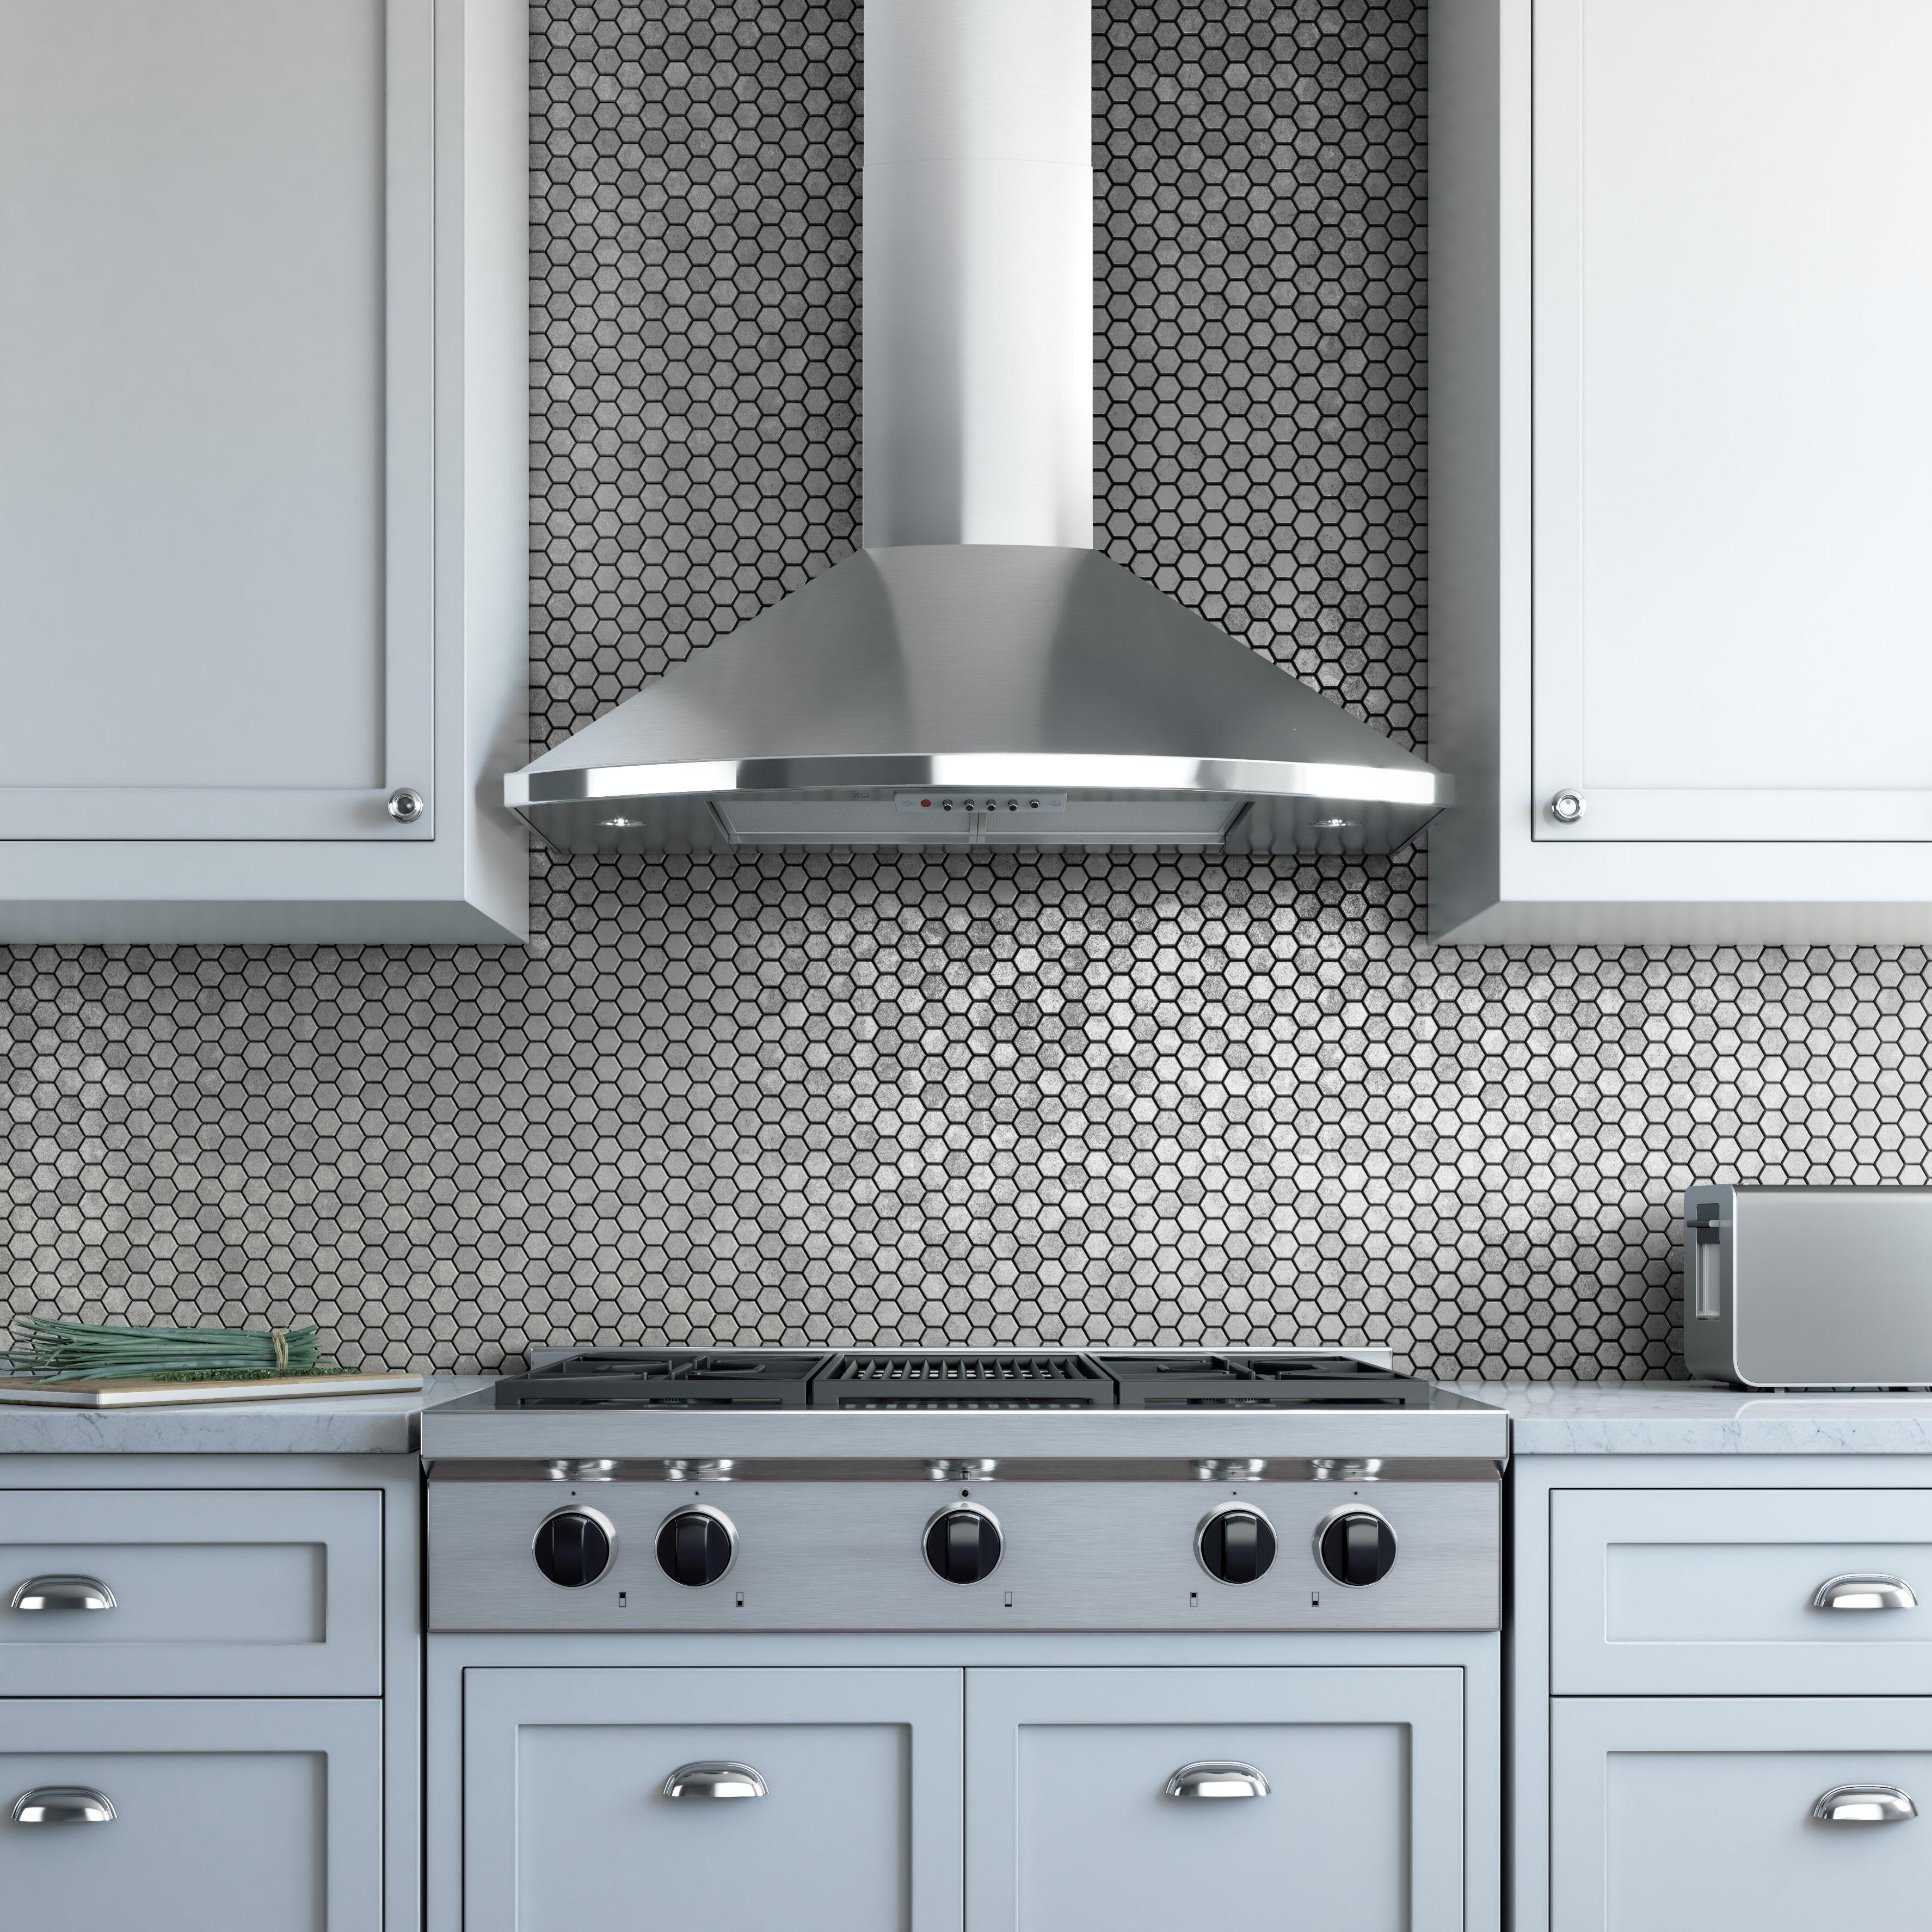 Xo Appliance 30 Fabriano 395 Cfm Convertible Wall Mount Range Hood Reviews Wayfair